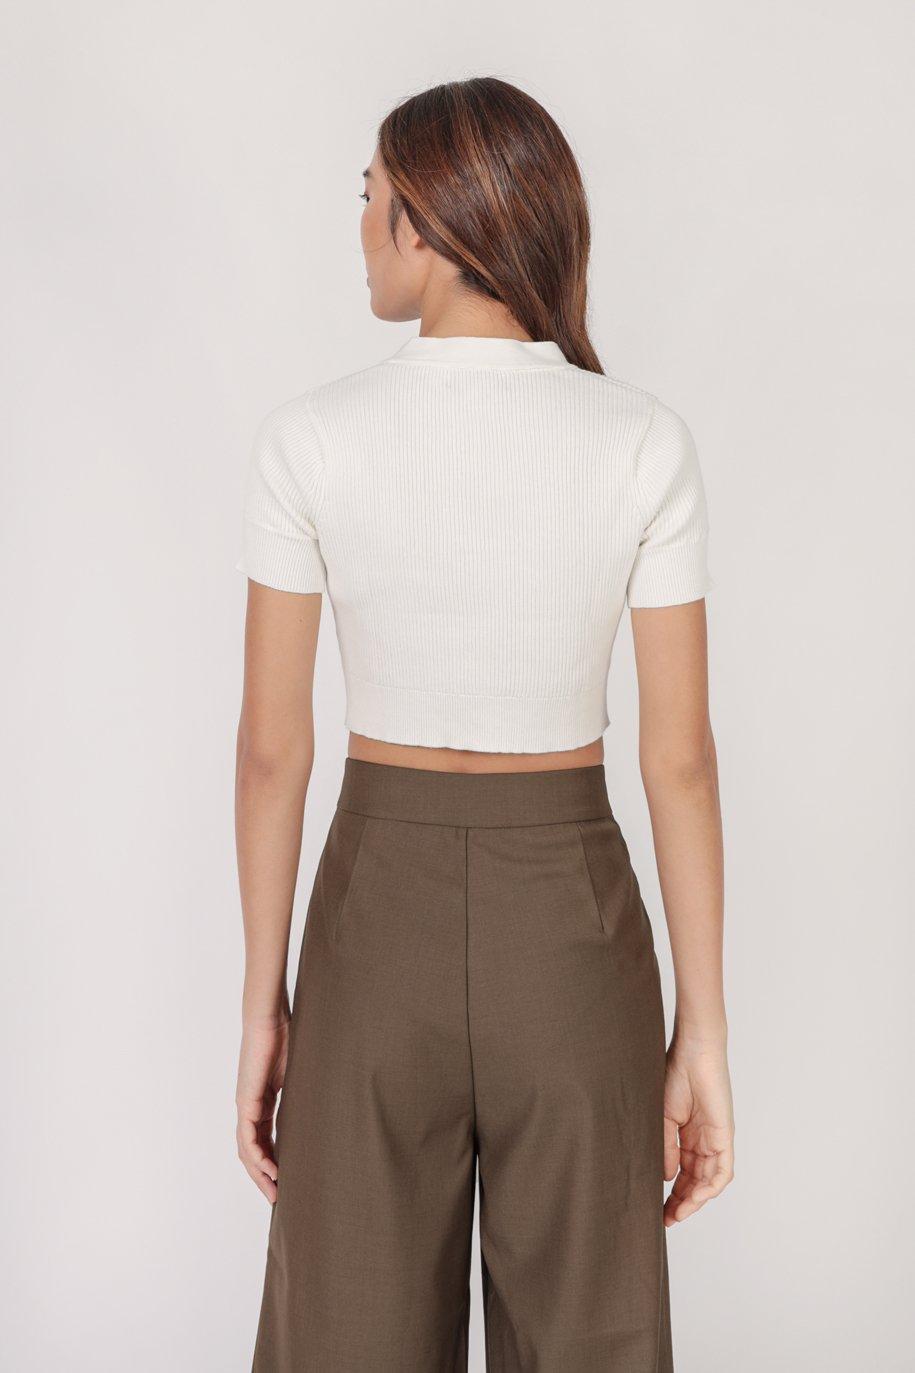 Marcie Button Knit Top (White)